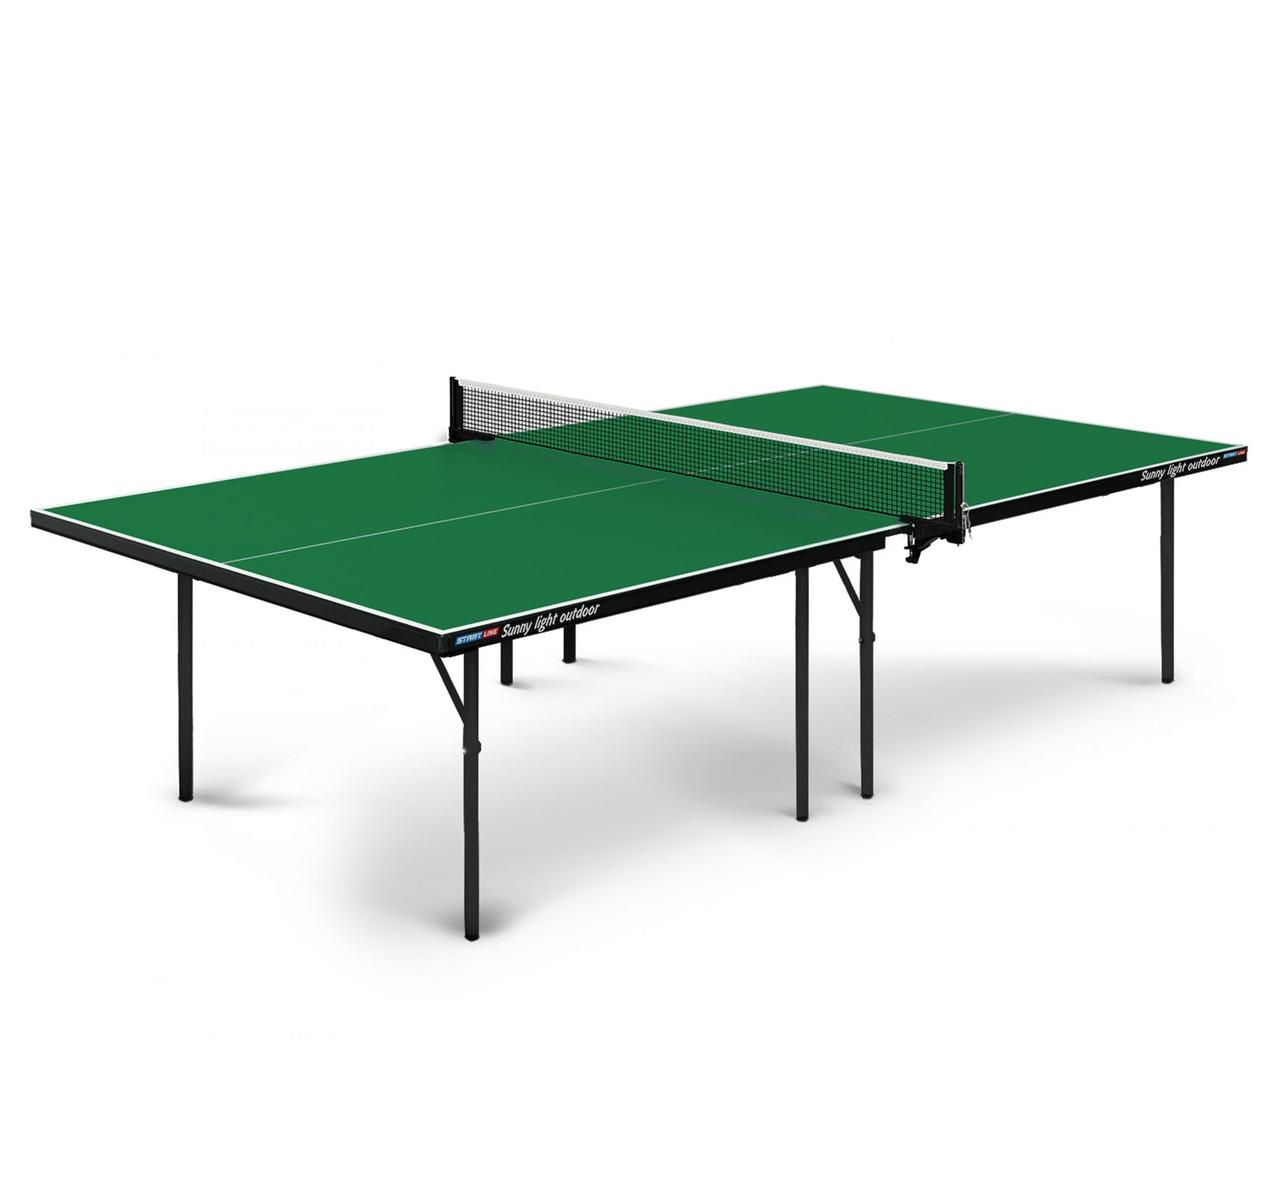 Теннисный стол Start line SUNNY light Outdoor Green - фото 1